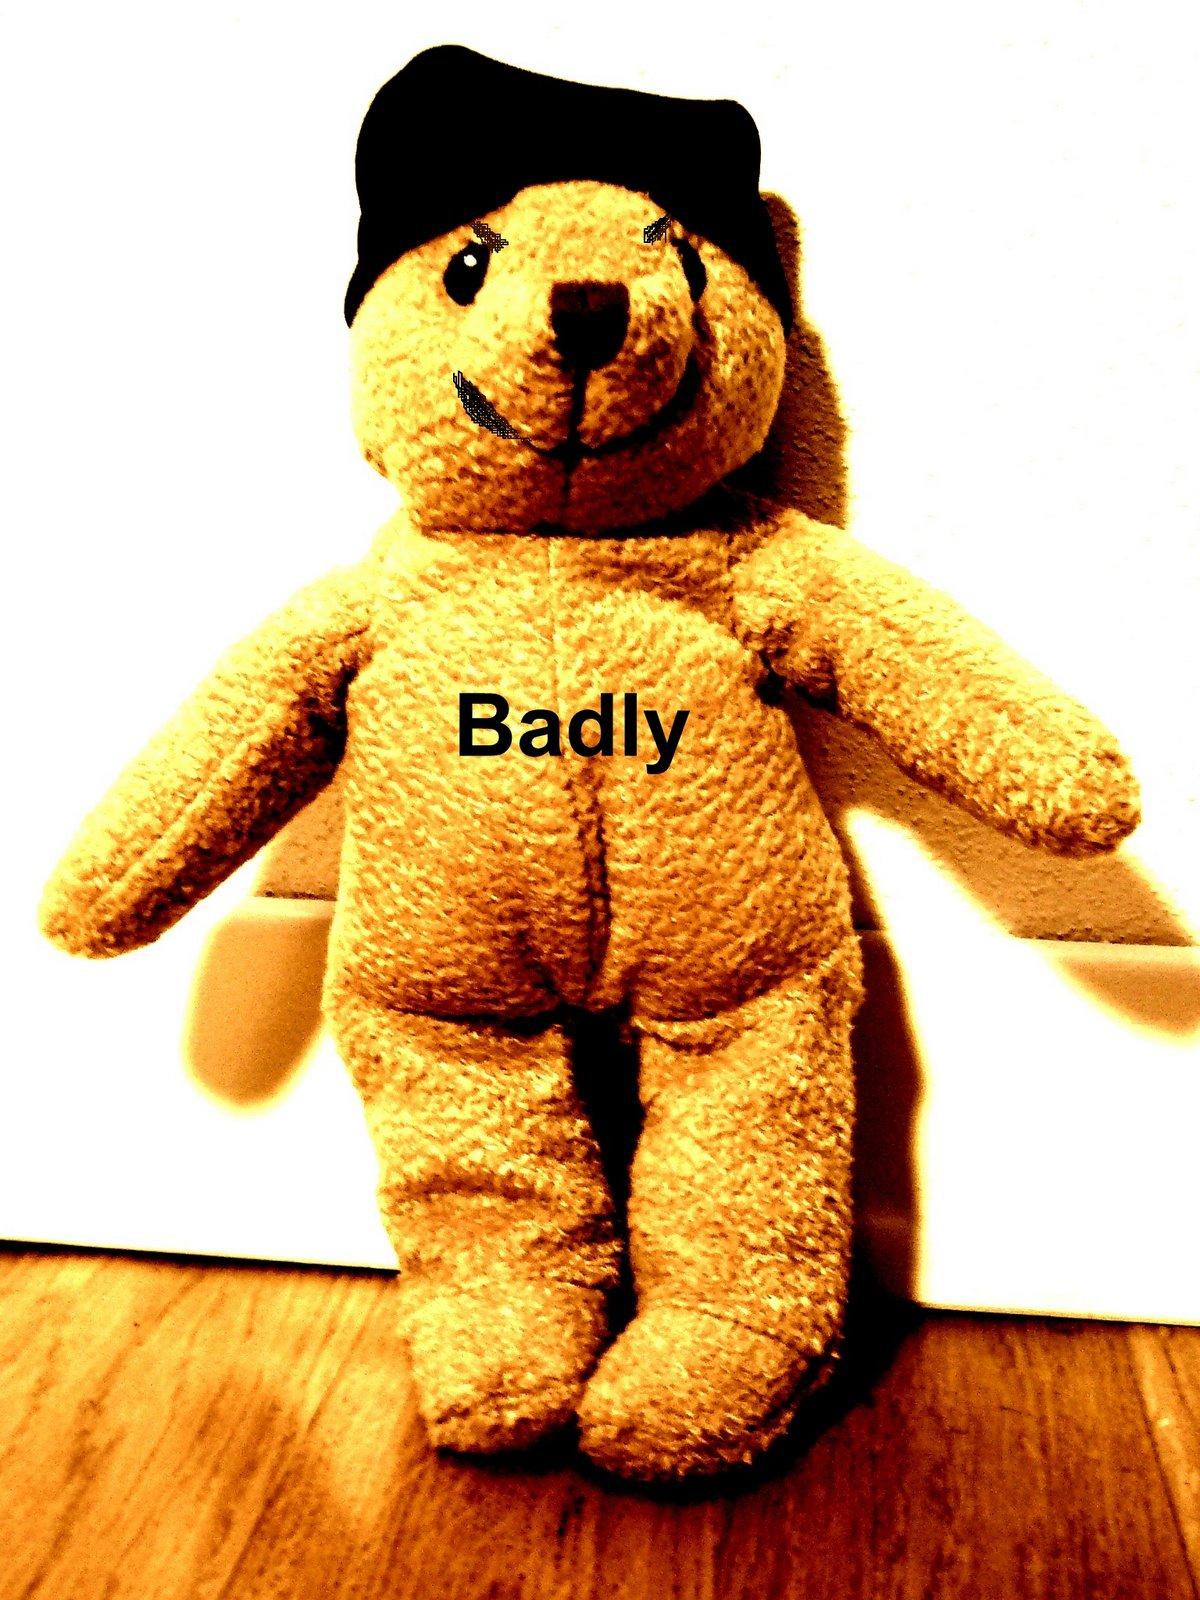 Badly  l'orço bastardo